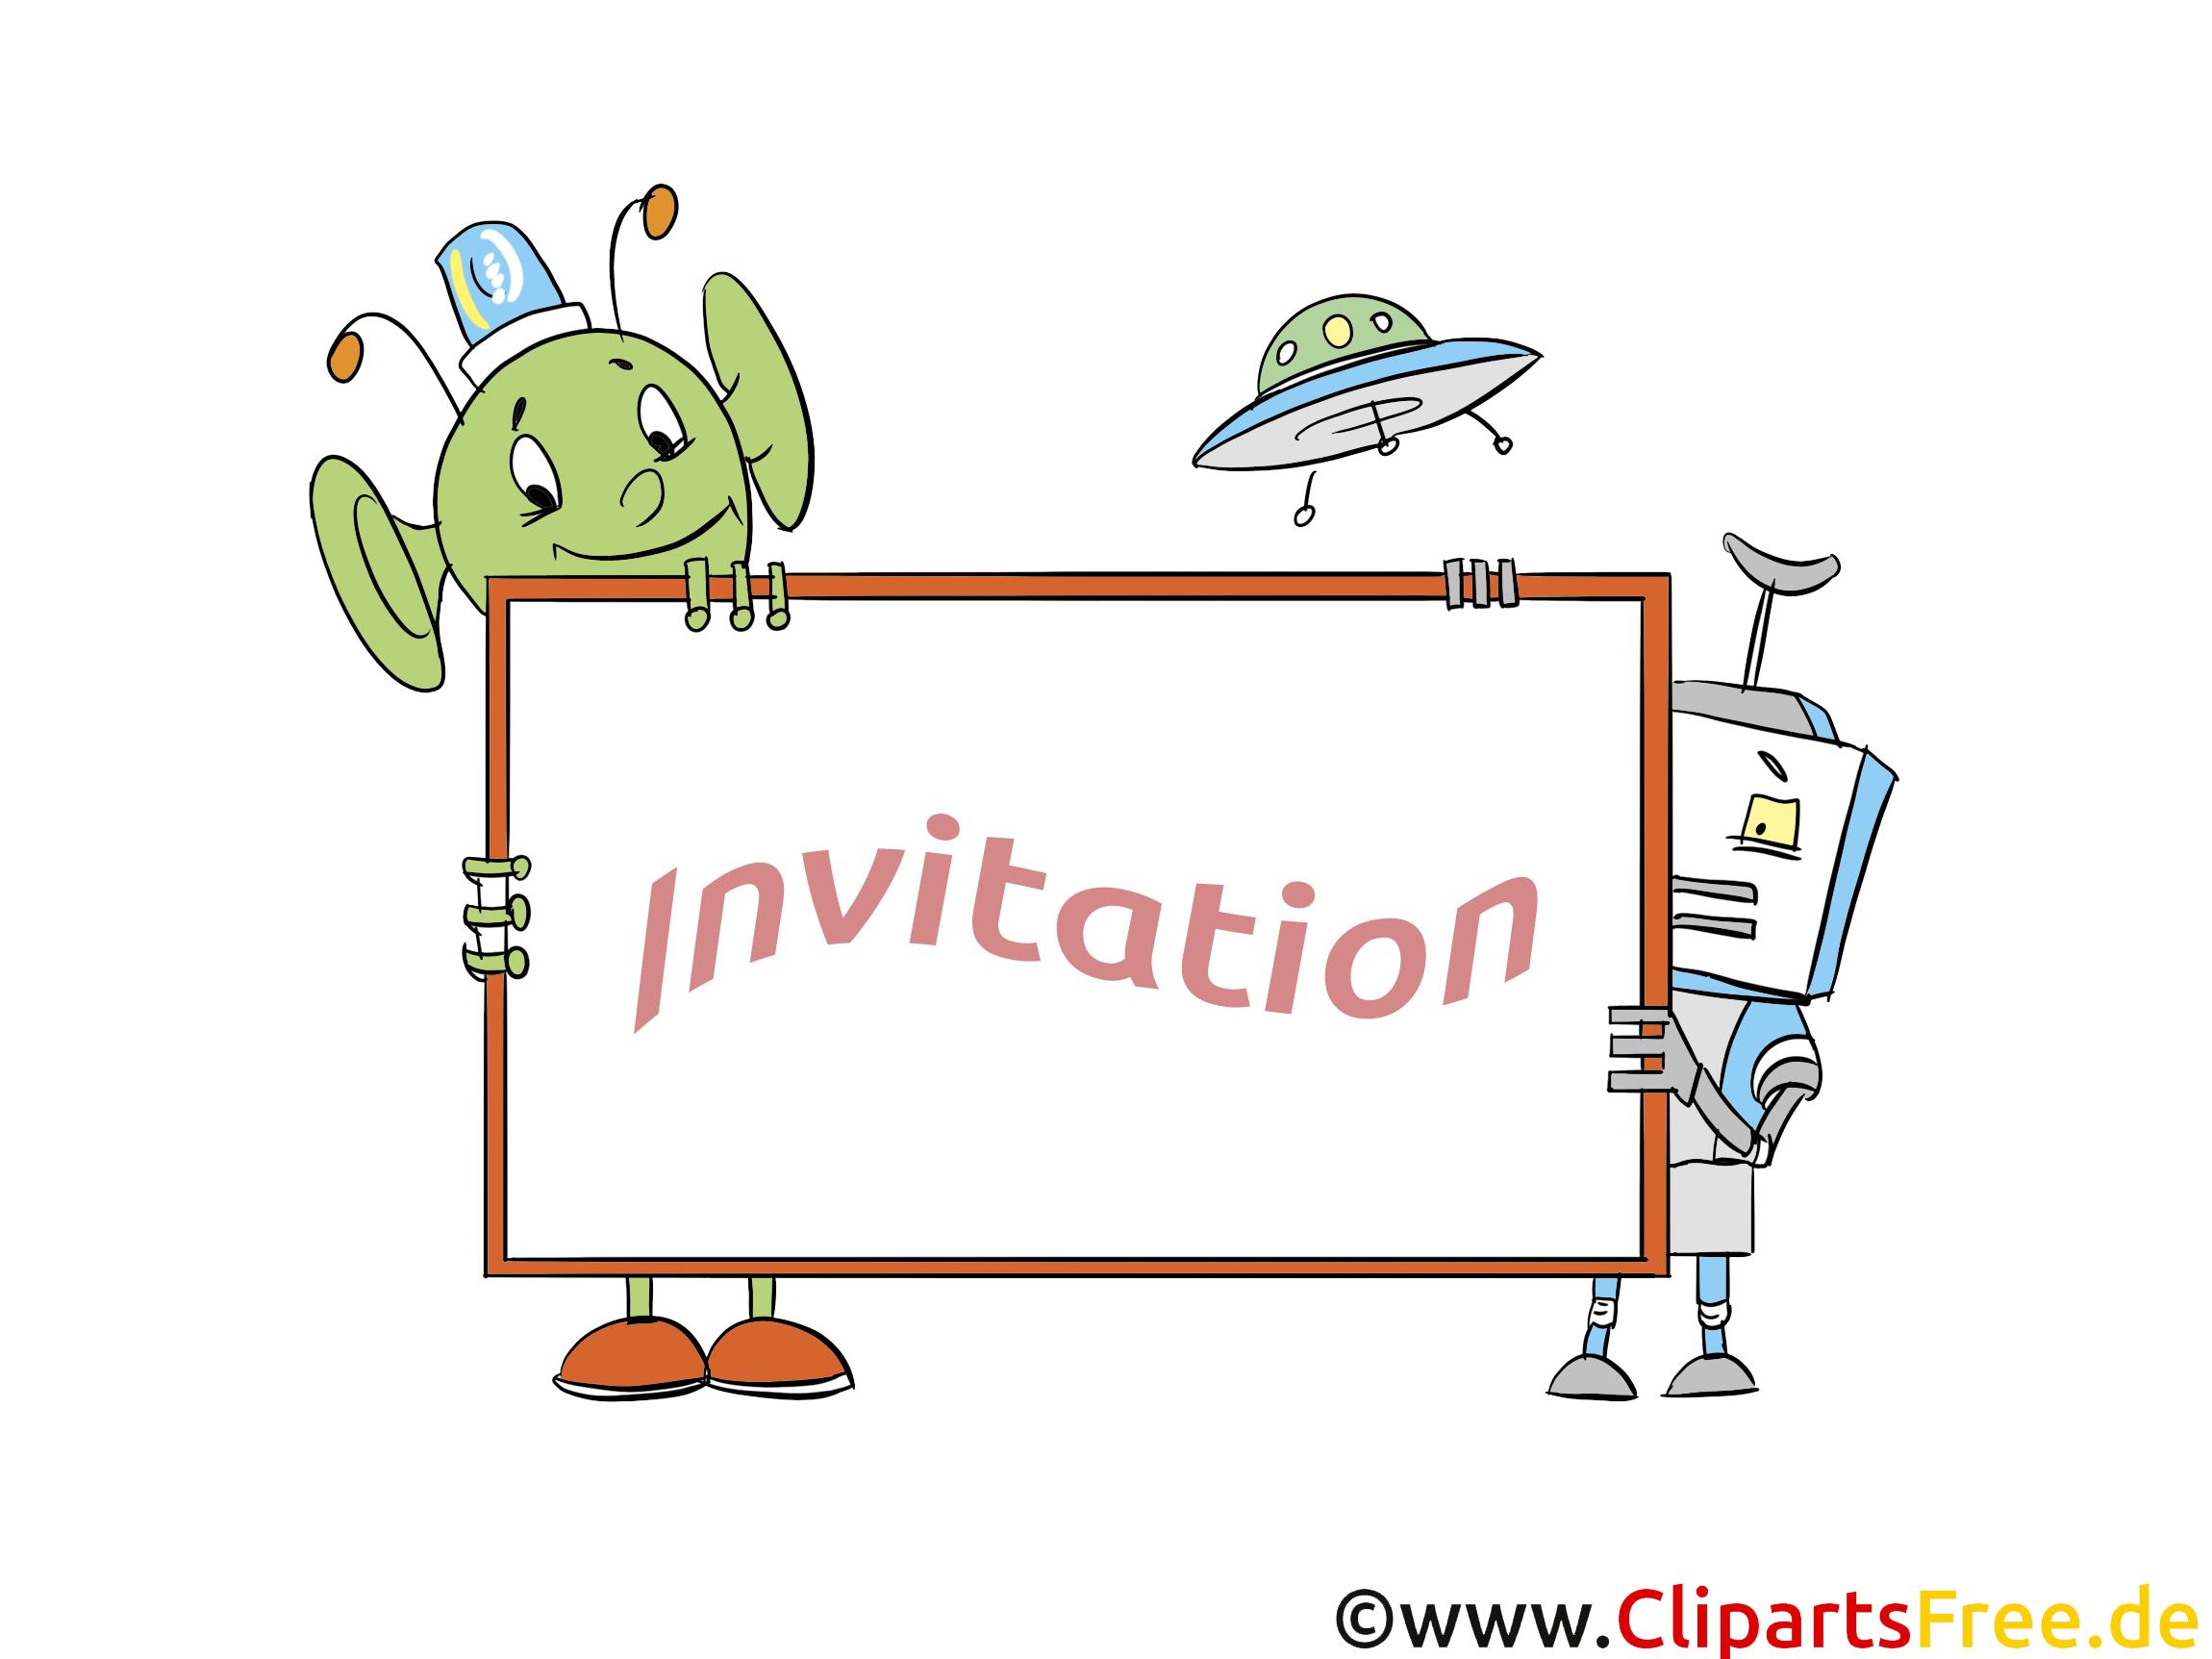 Extraterrestre cliparts gratuis - Invitation images